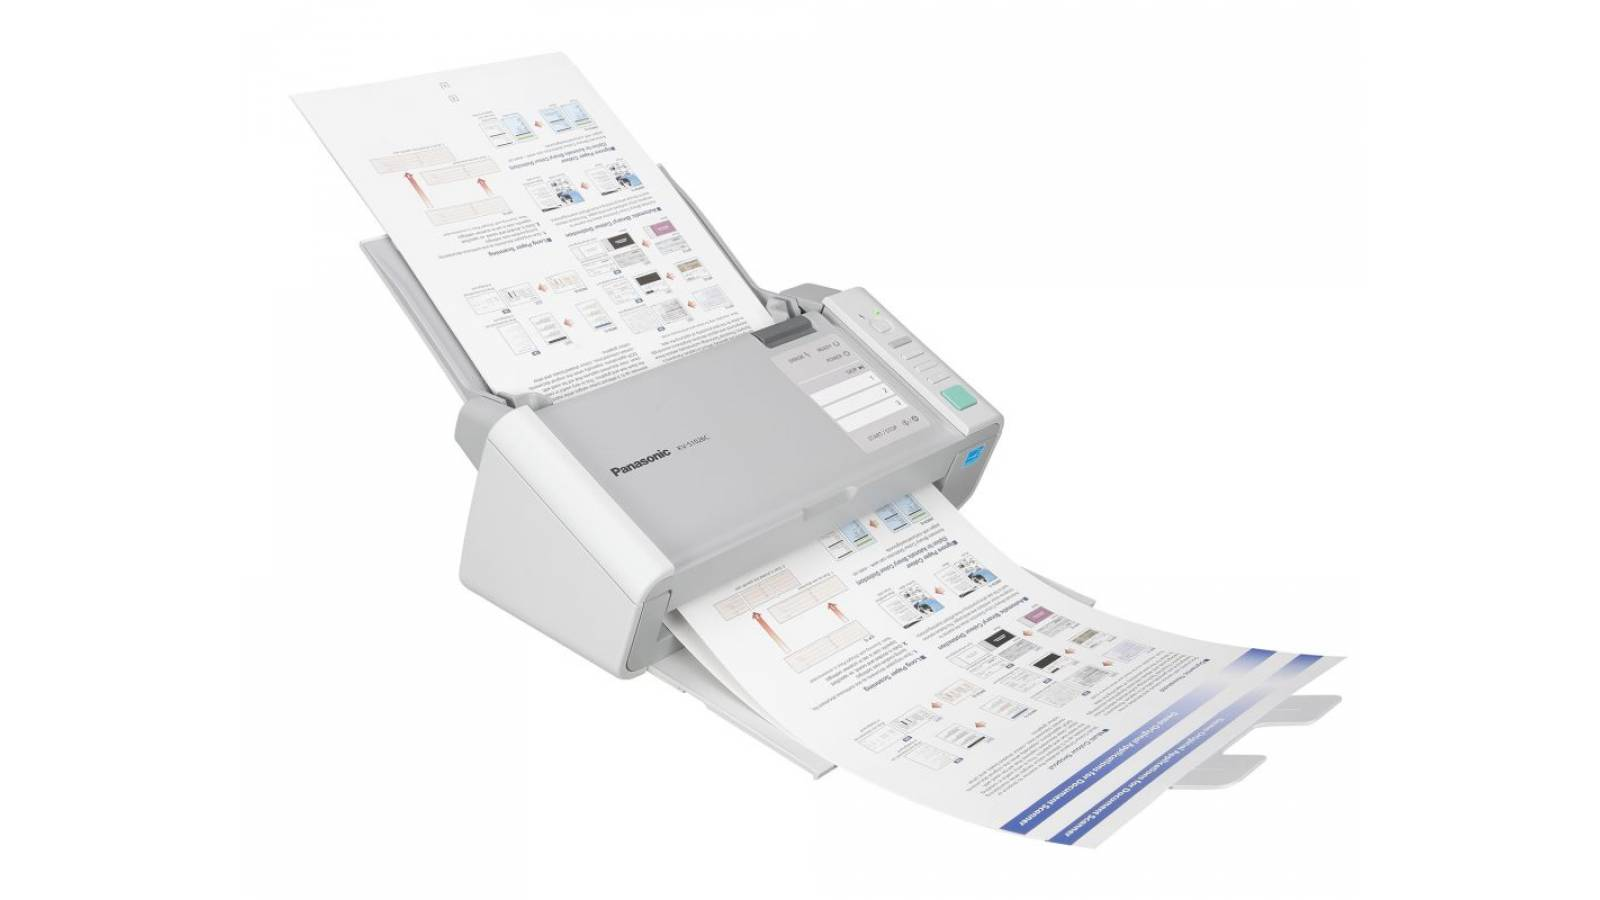 Escáner Panasonic KV-S1026C-X